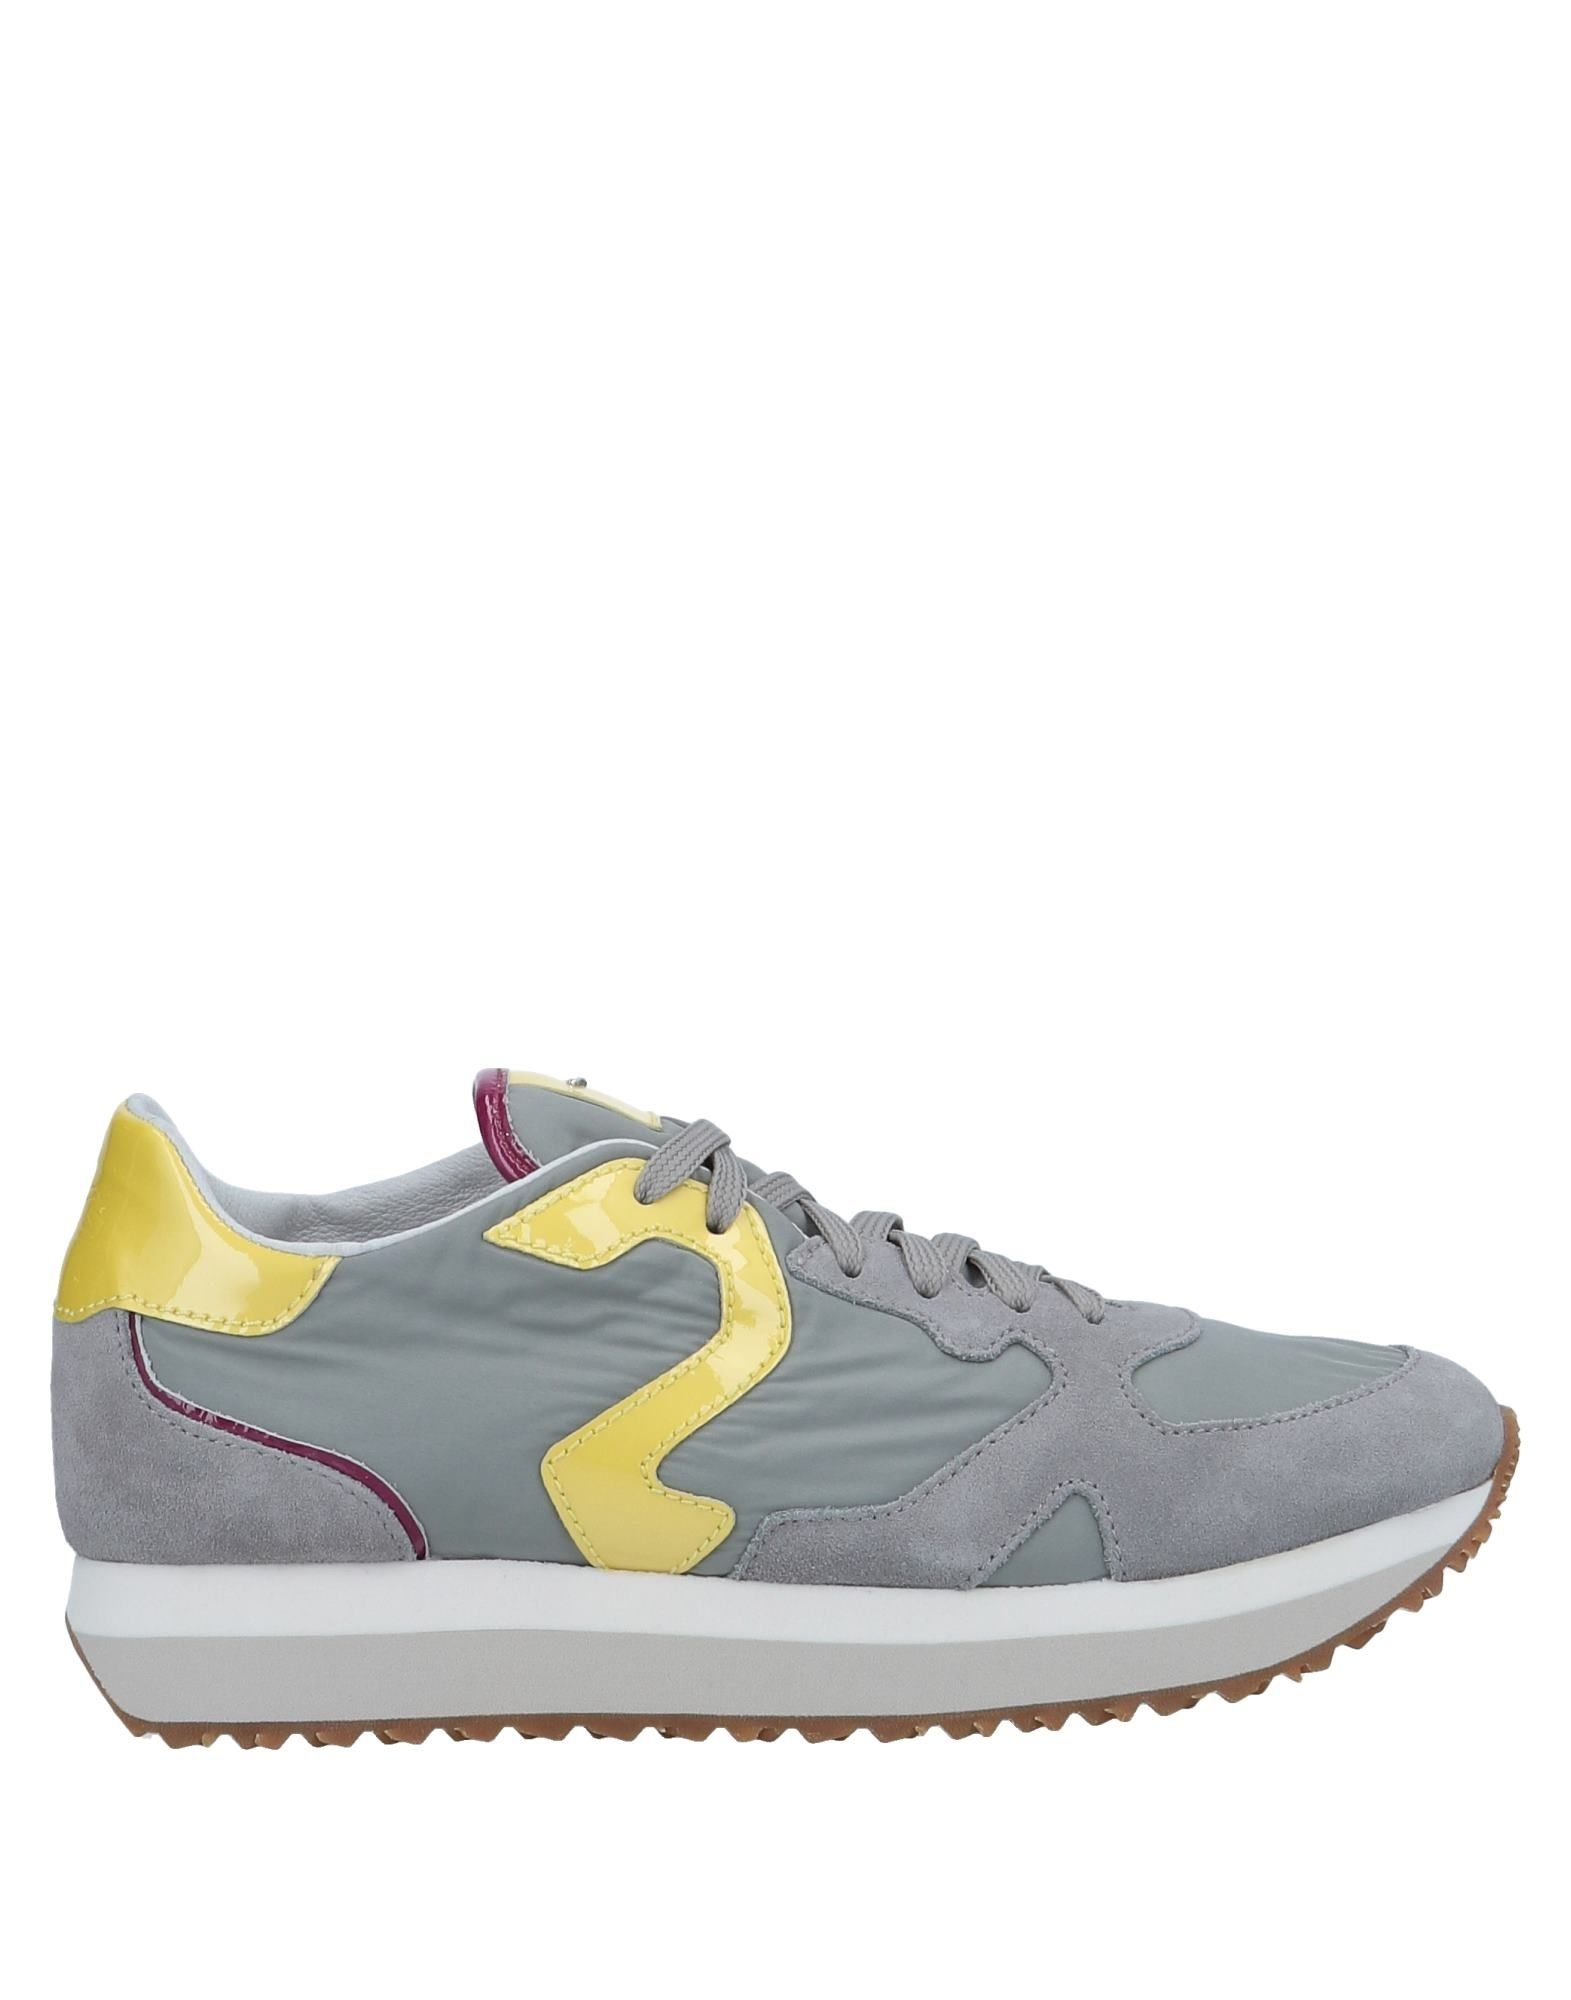 Alberto Guardiani Sneakers - Women Alberto Guardiani Sneakers online on 11567991OK  United Kingdom - 11567991OK on 84eebf